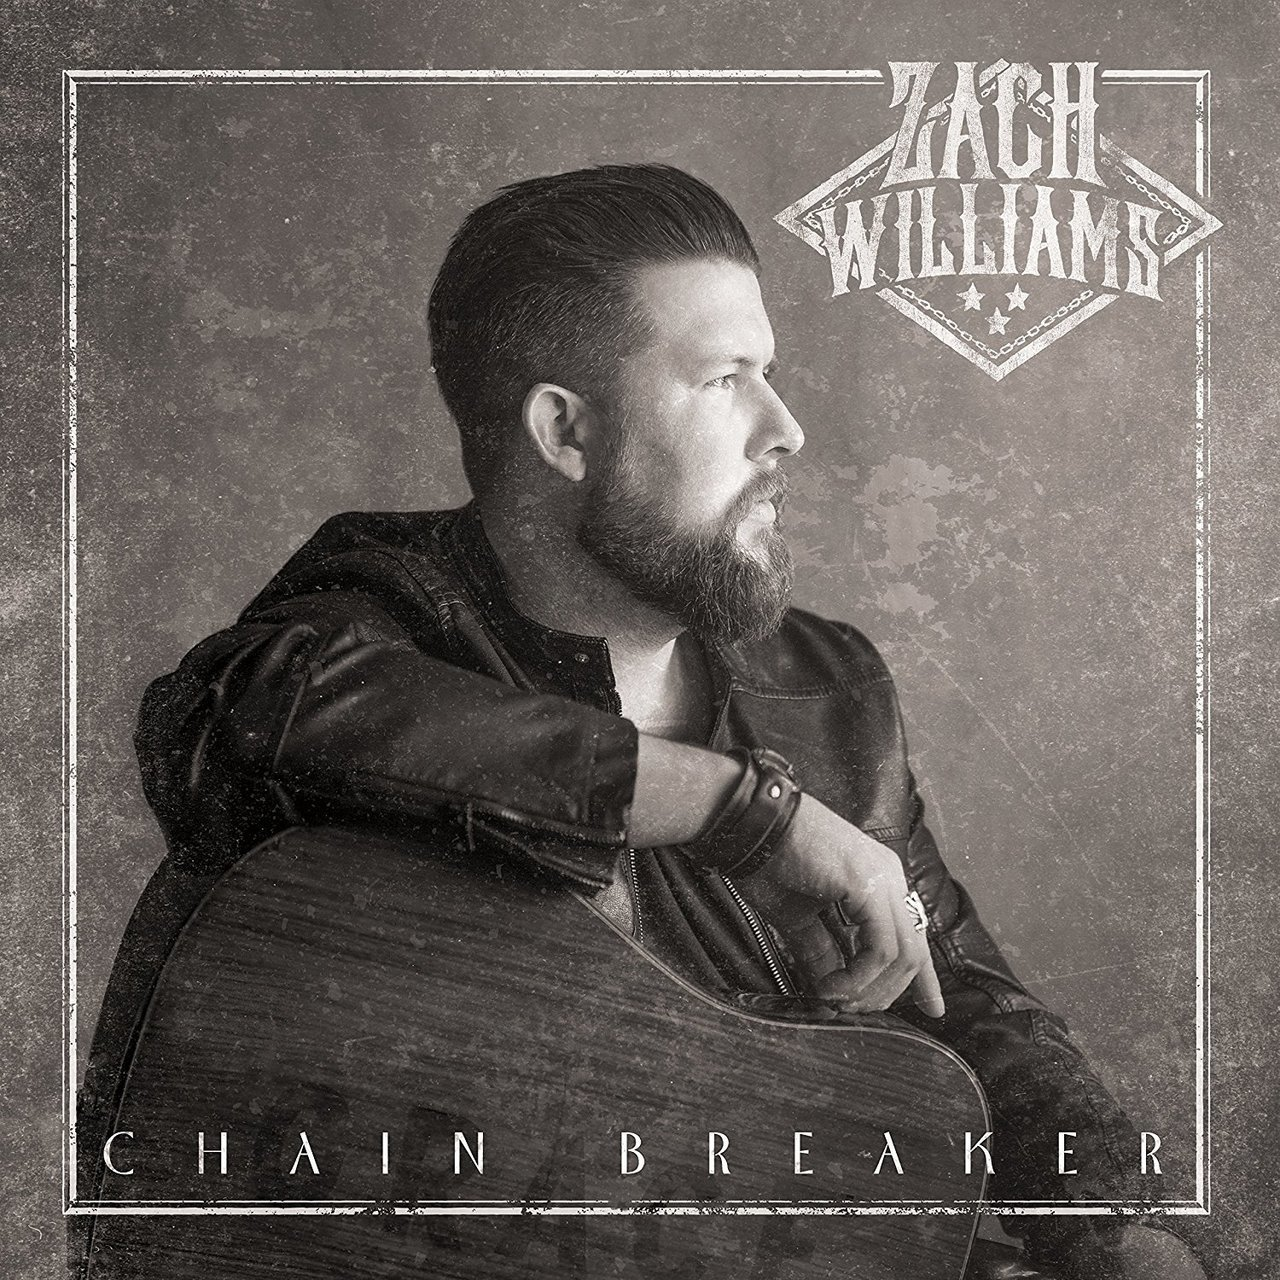 Chain breaker by zach williams